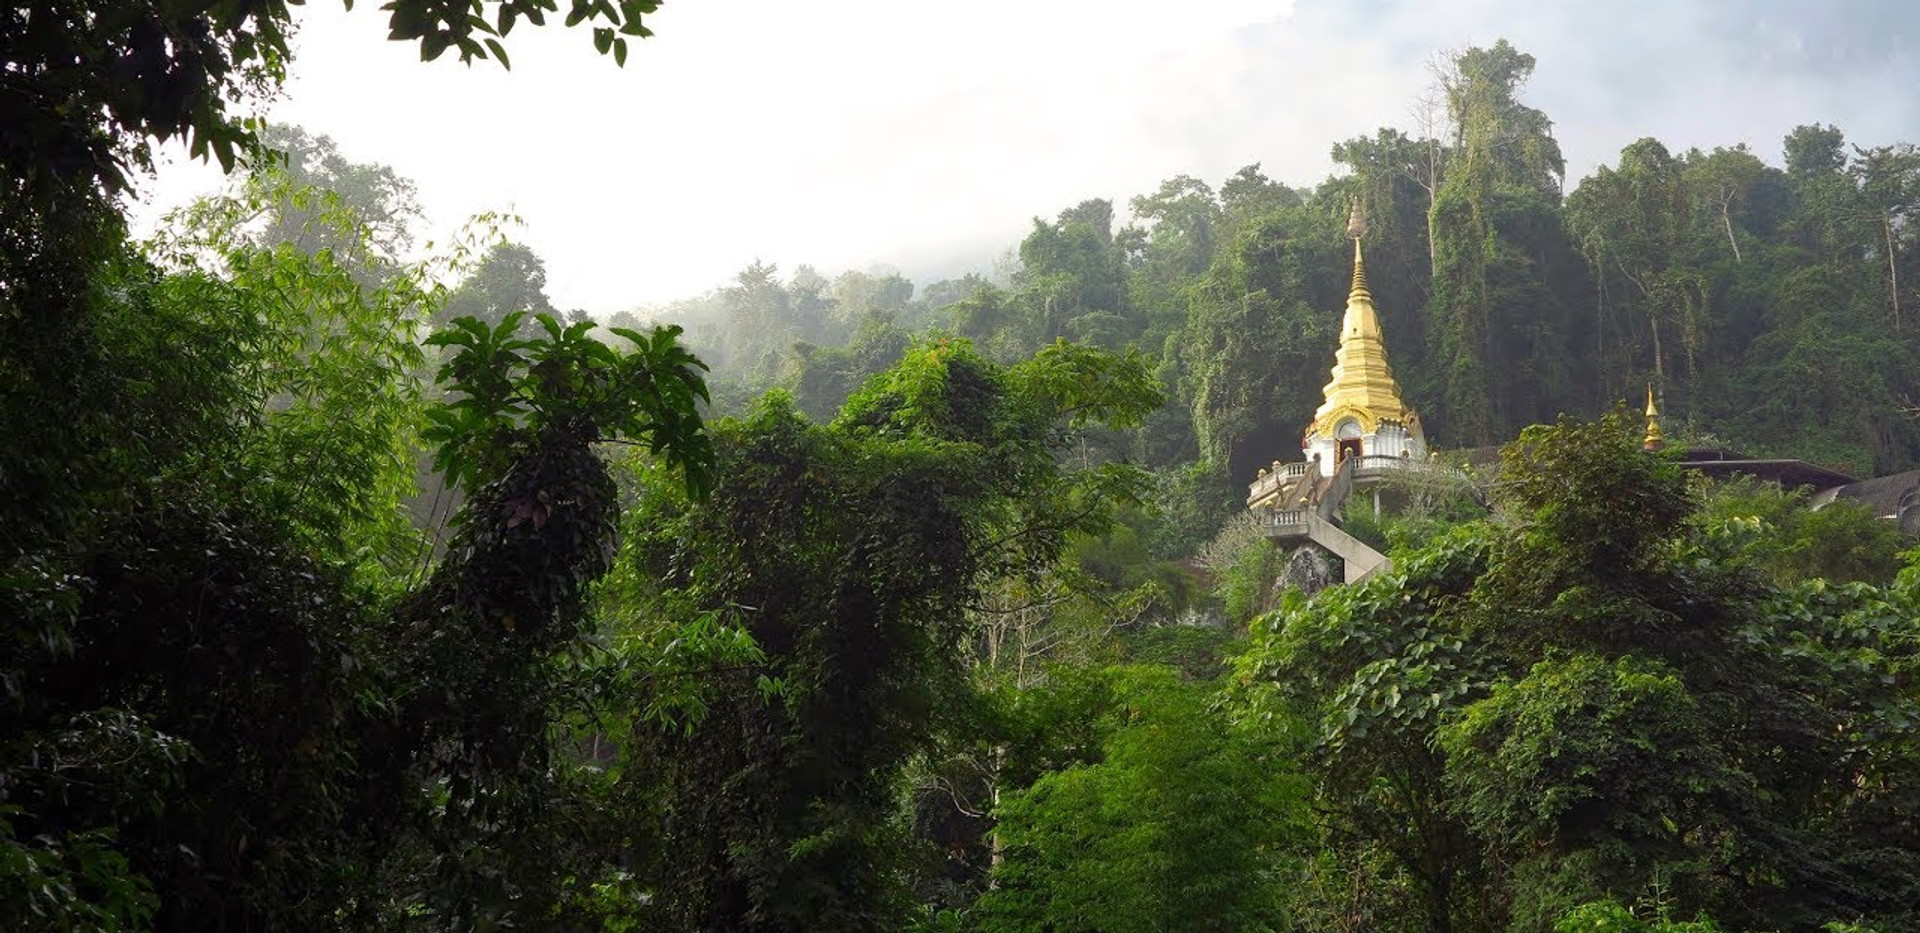 Thailand Yoga Holidays Destination Hideaway Hill Video